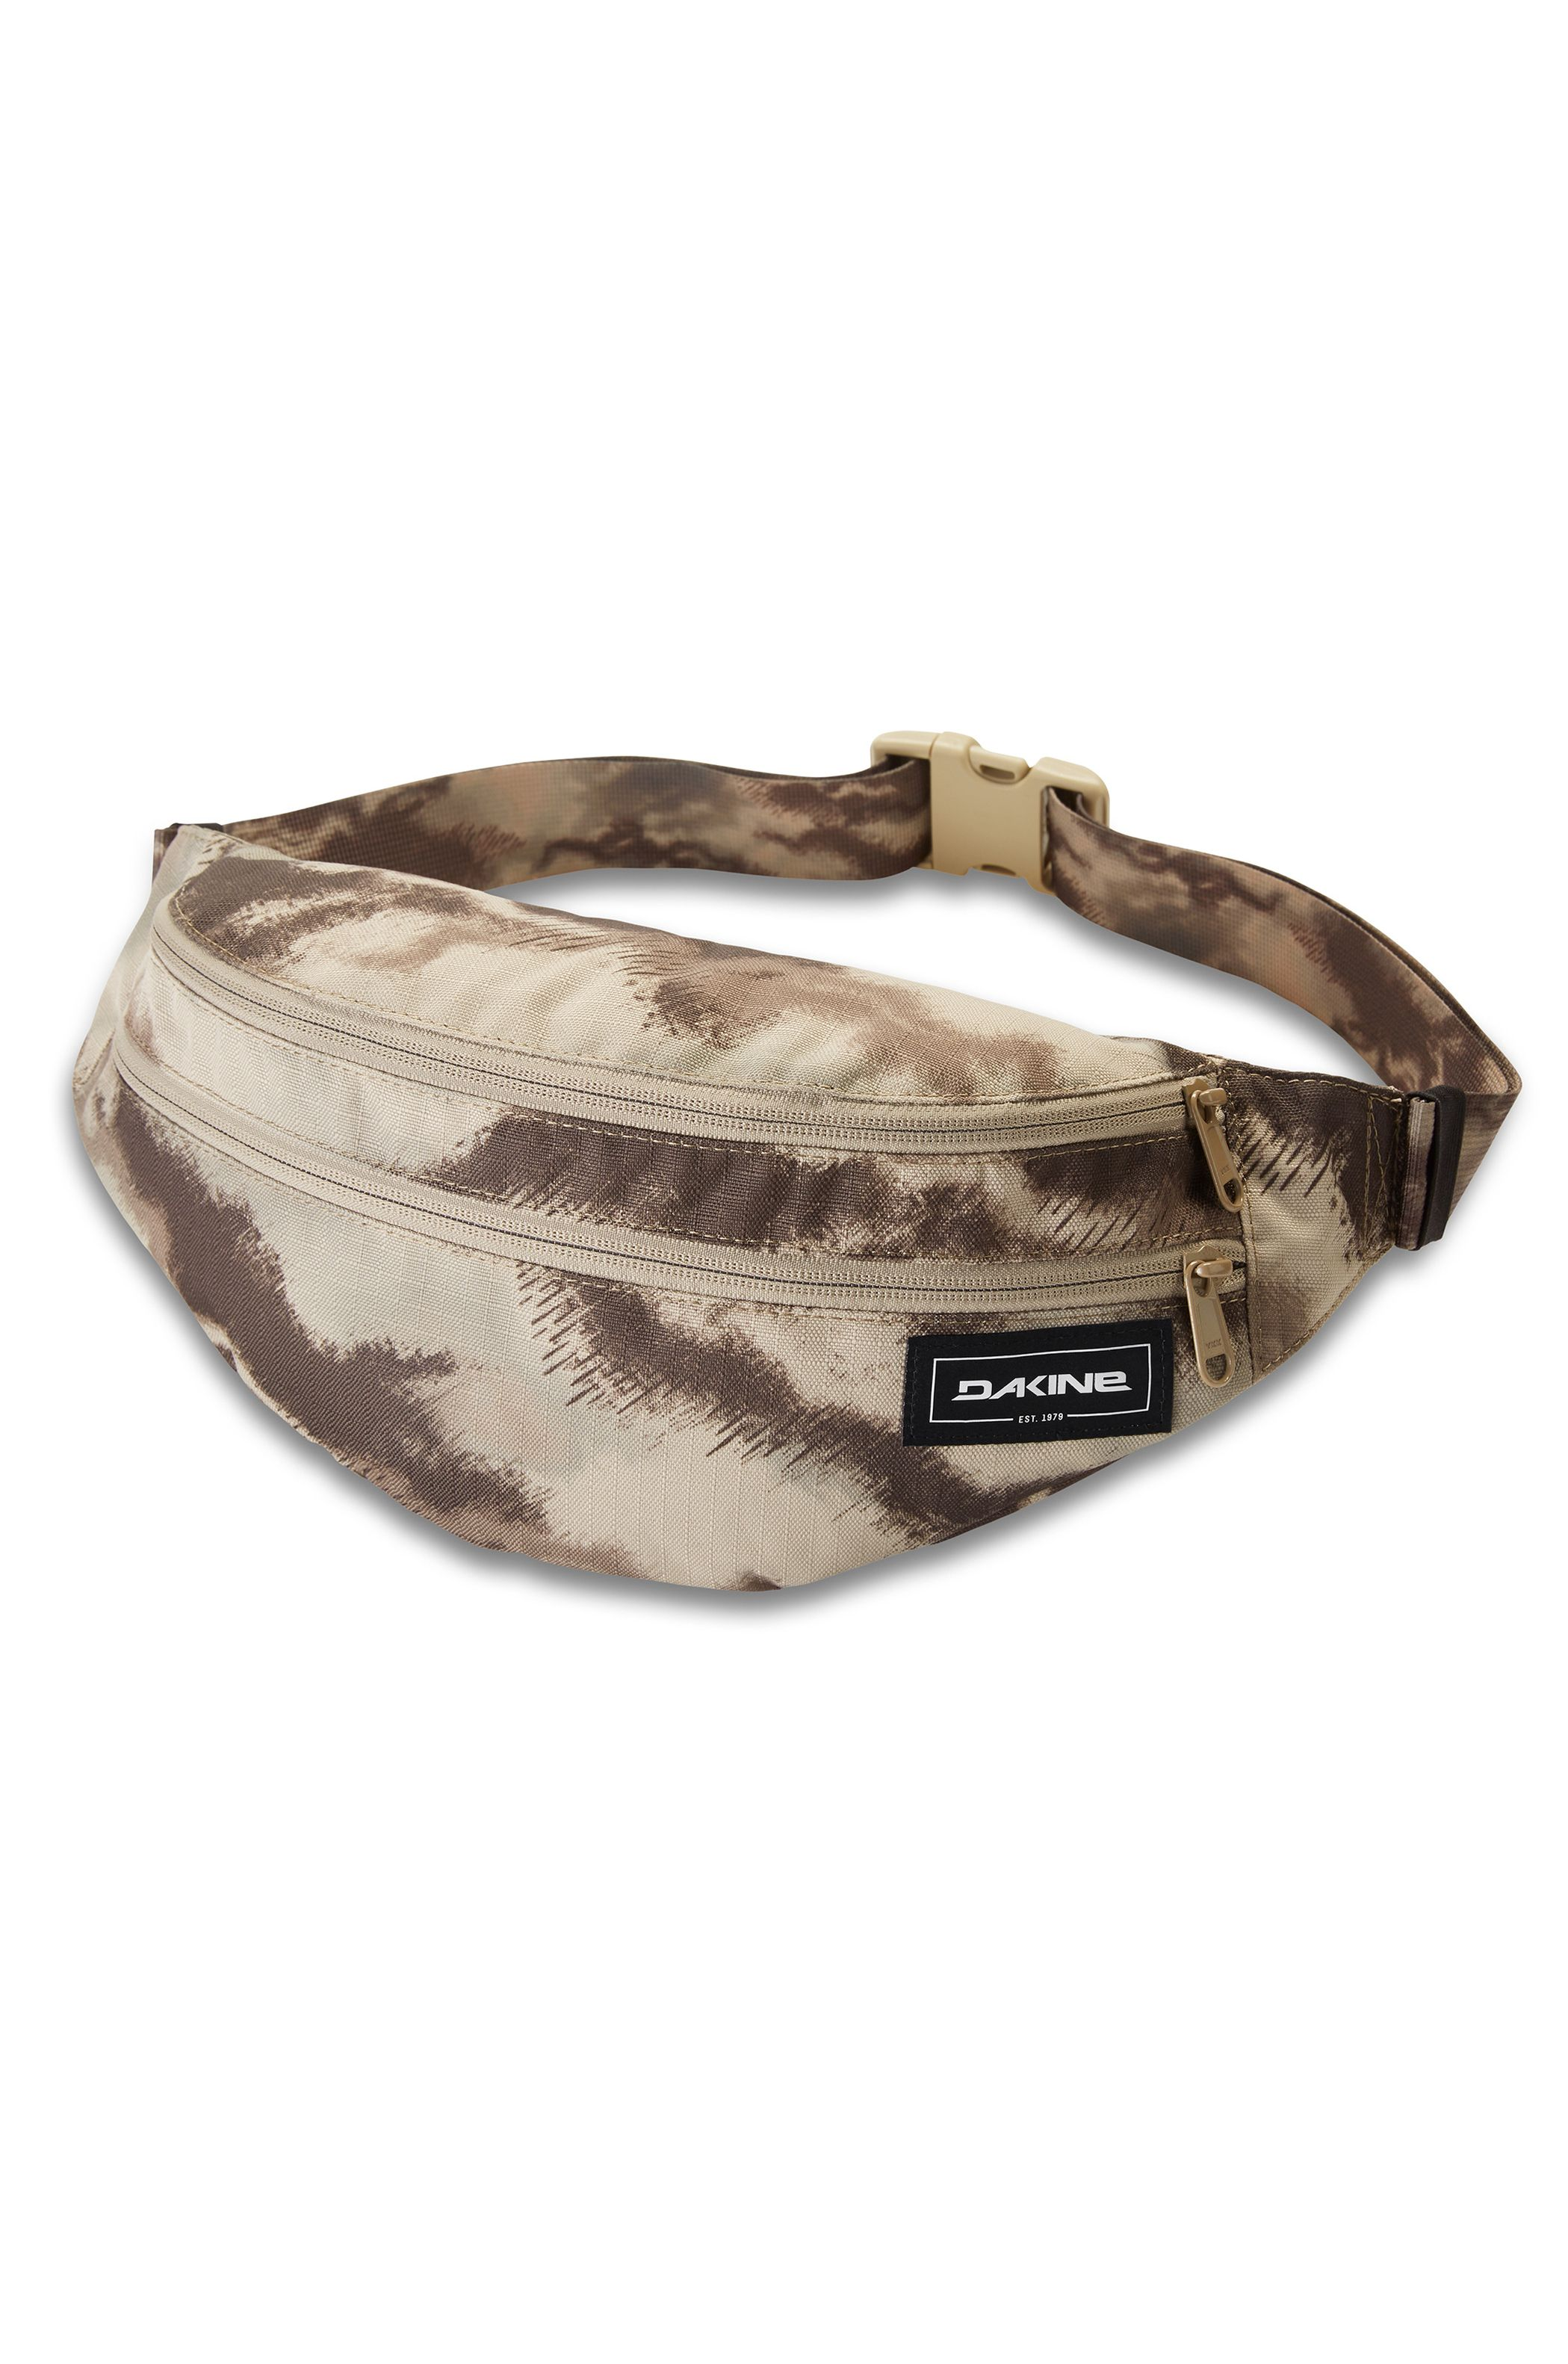 Dakine Waist Bag CLASSIC HIP PACK LARGE Ashcroft Camo